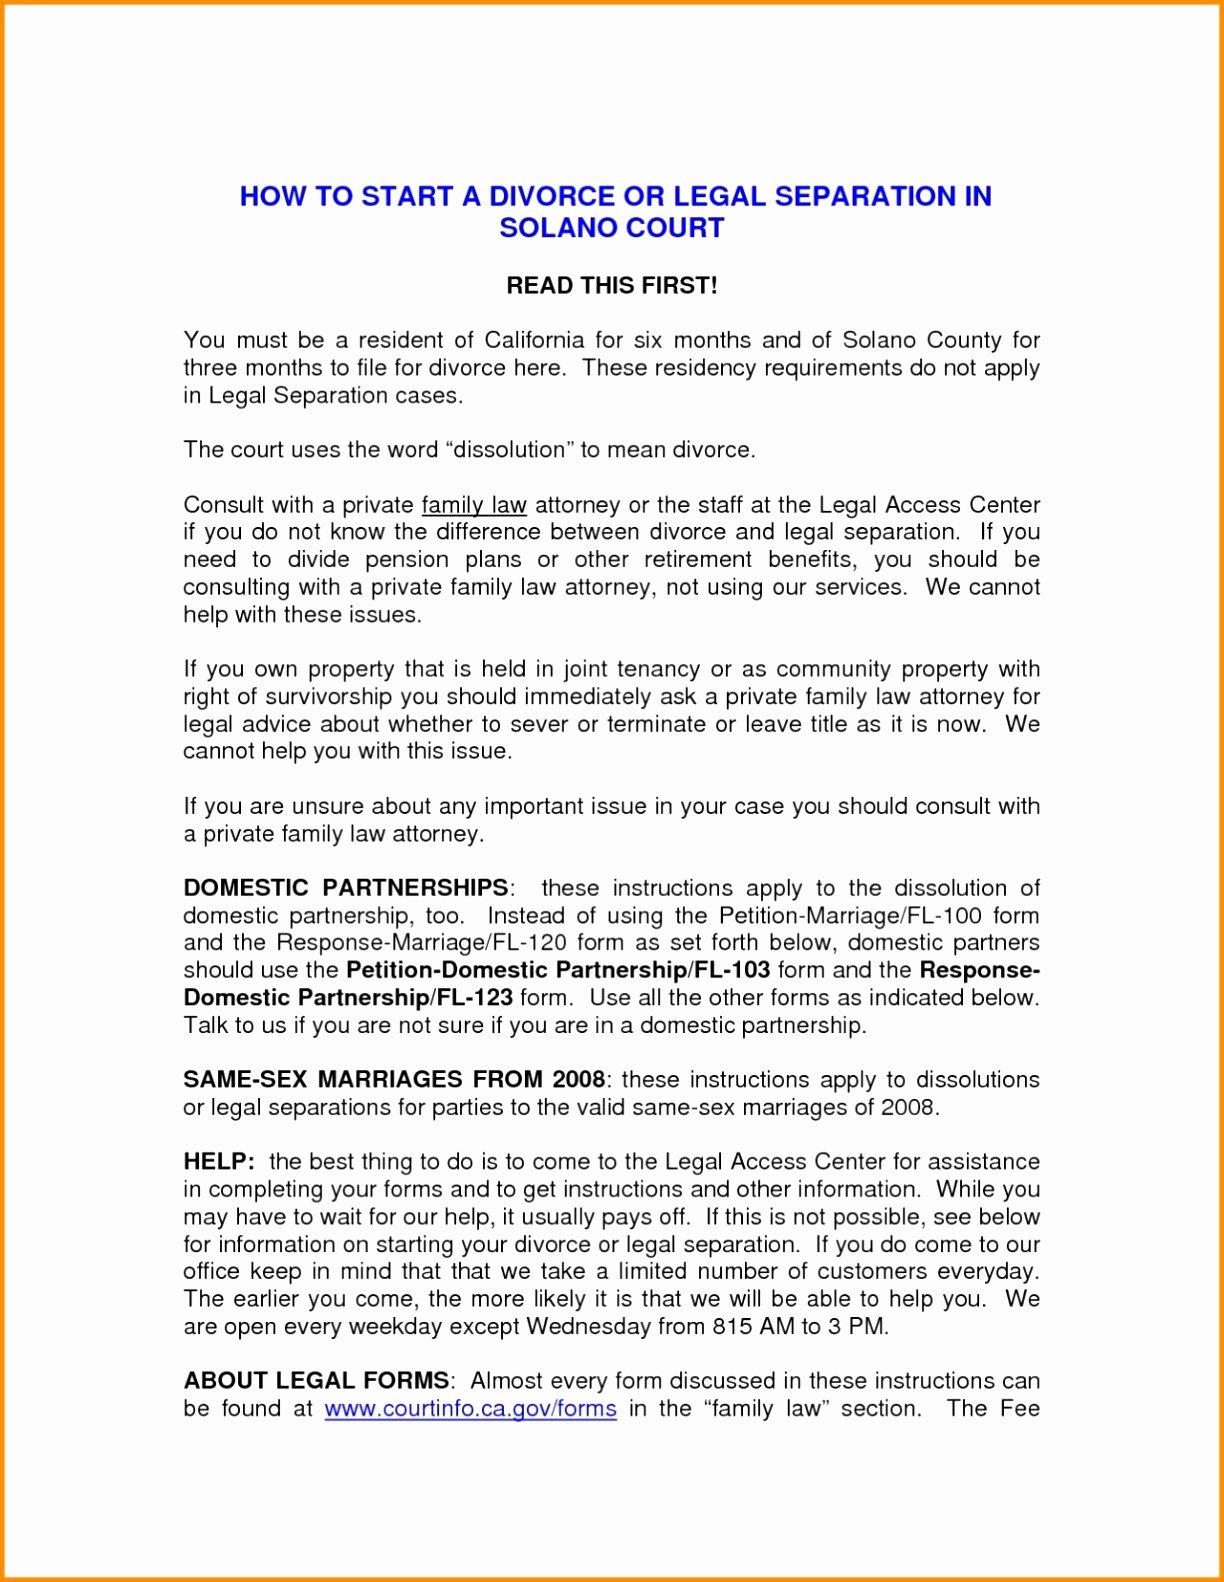 Tenant Buyout Agreement Example New Tenant Buyout Agreement Example Luxury Promise to Sell